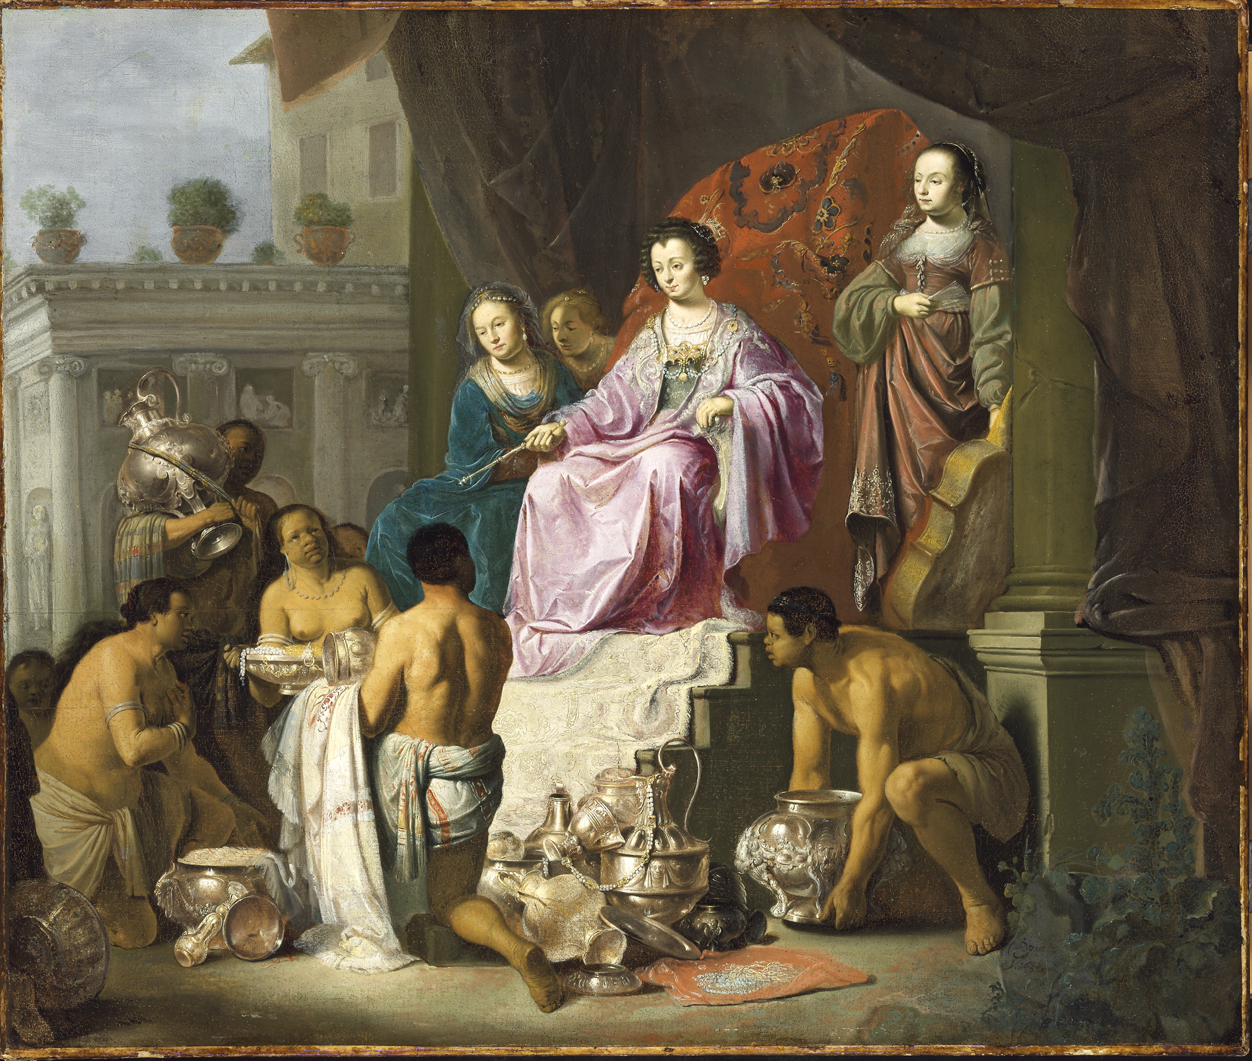 Fig. 5. Willem de Poorter (1608-1649/68), <em>Allegory of Colonial Power</em>, 1638<br>Szépművészeti Múzeum, Budapest